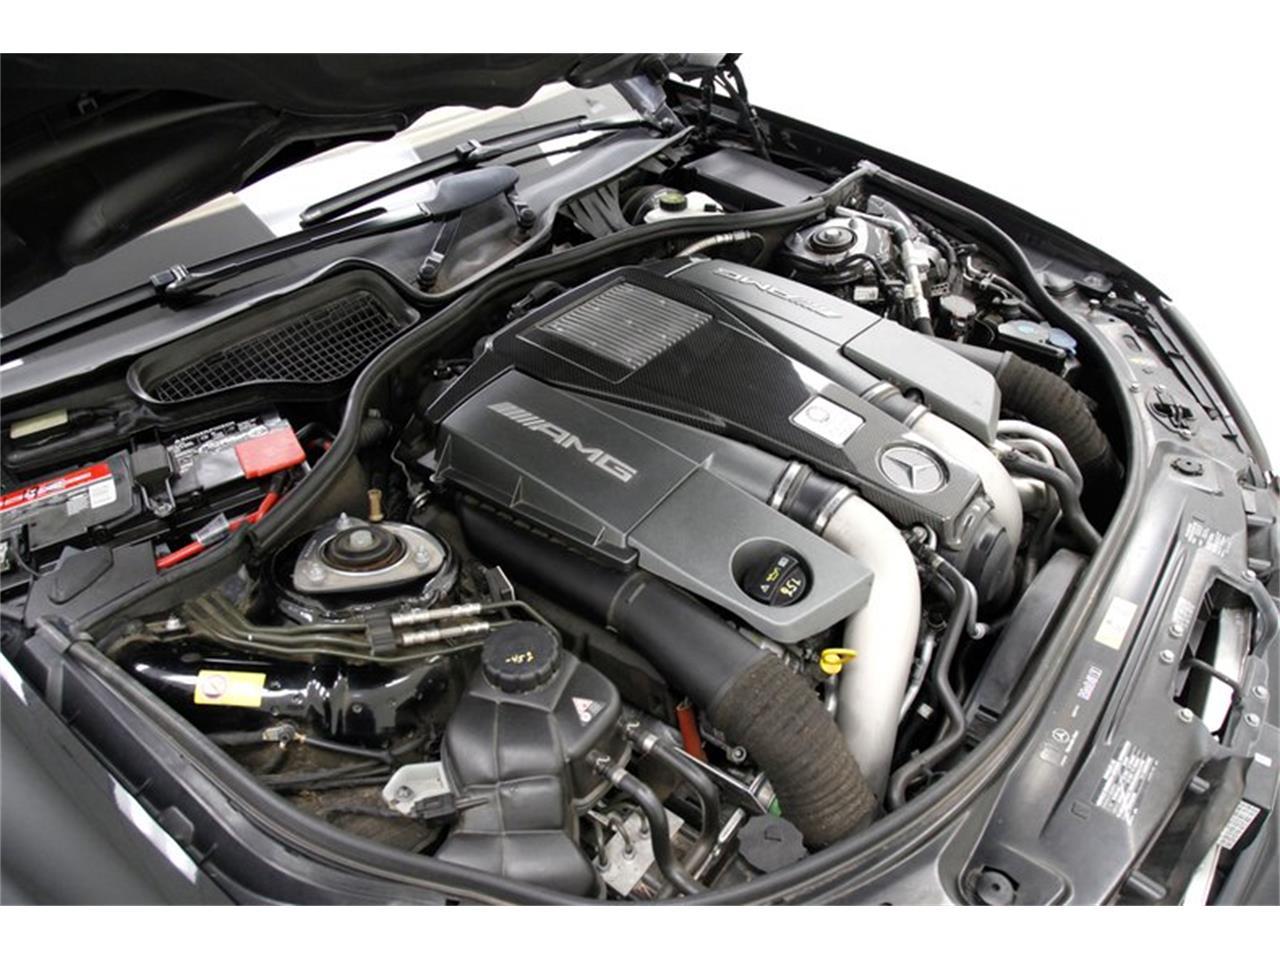 2013 Mercedes-Benz S-Class (CC-1419253) for sale in Morgantown, Pennsylvania